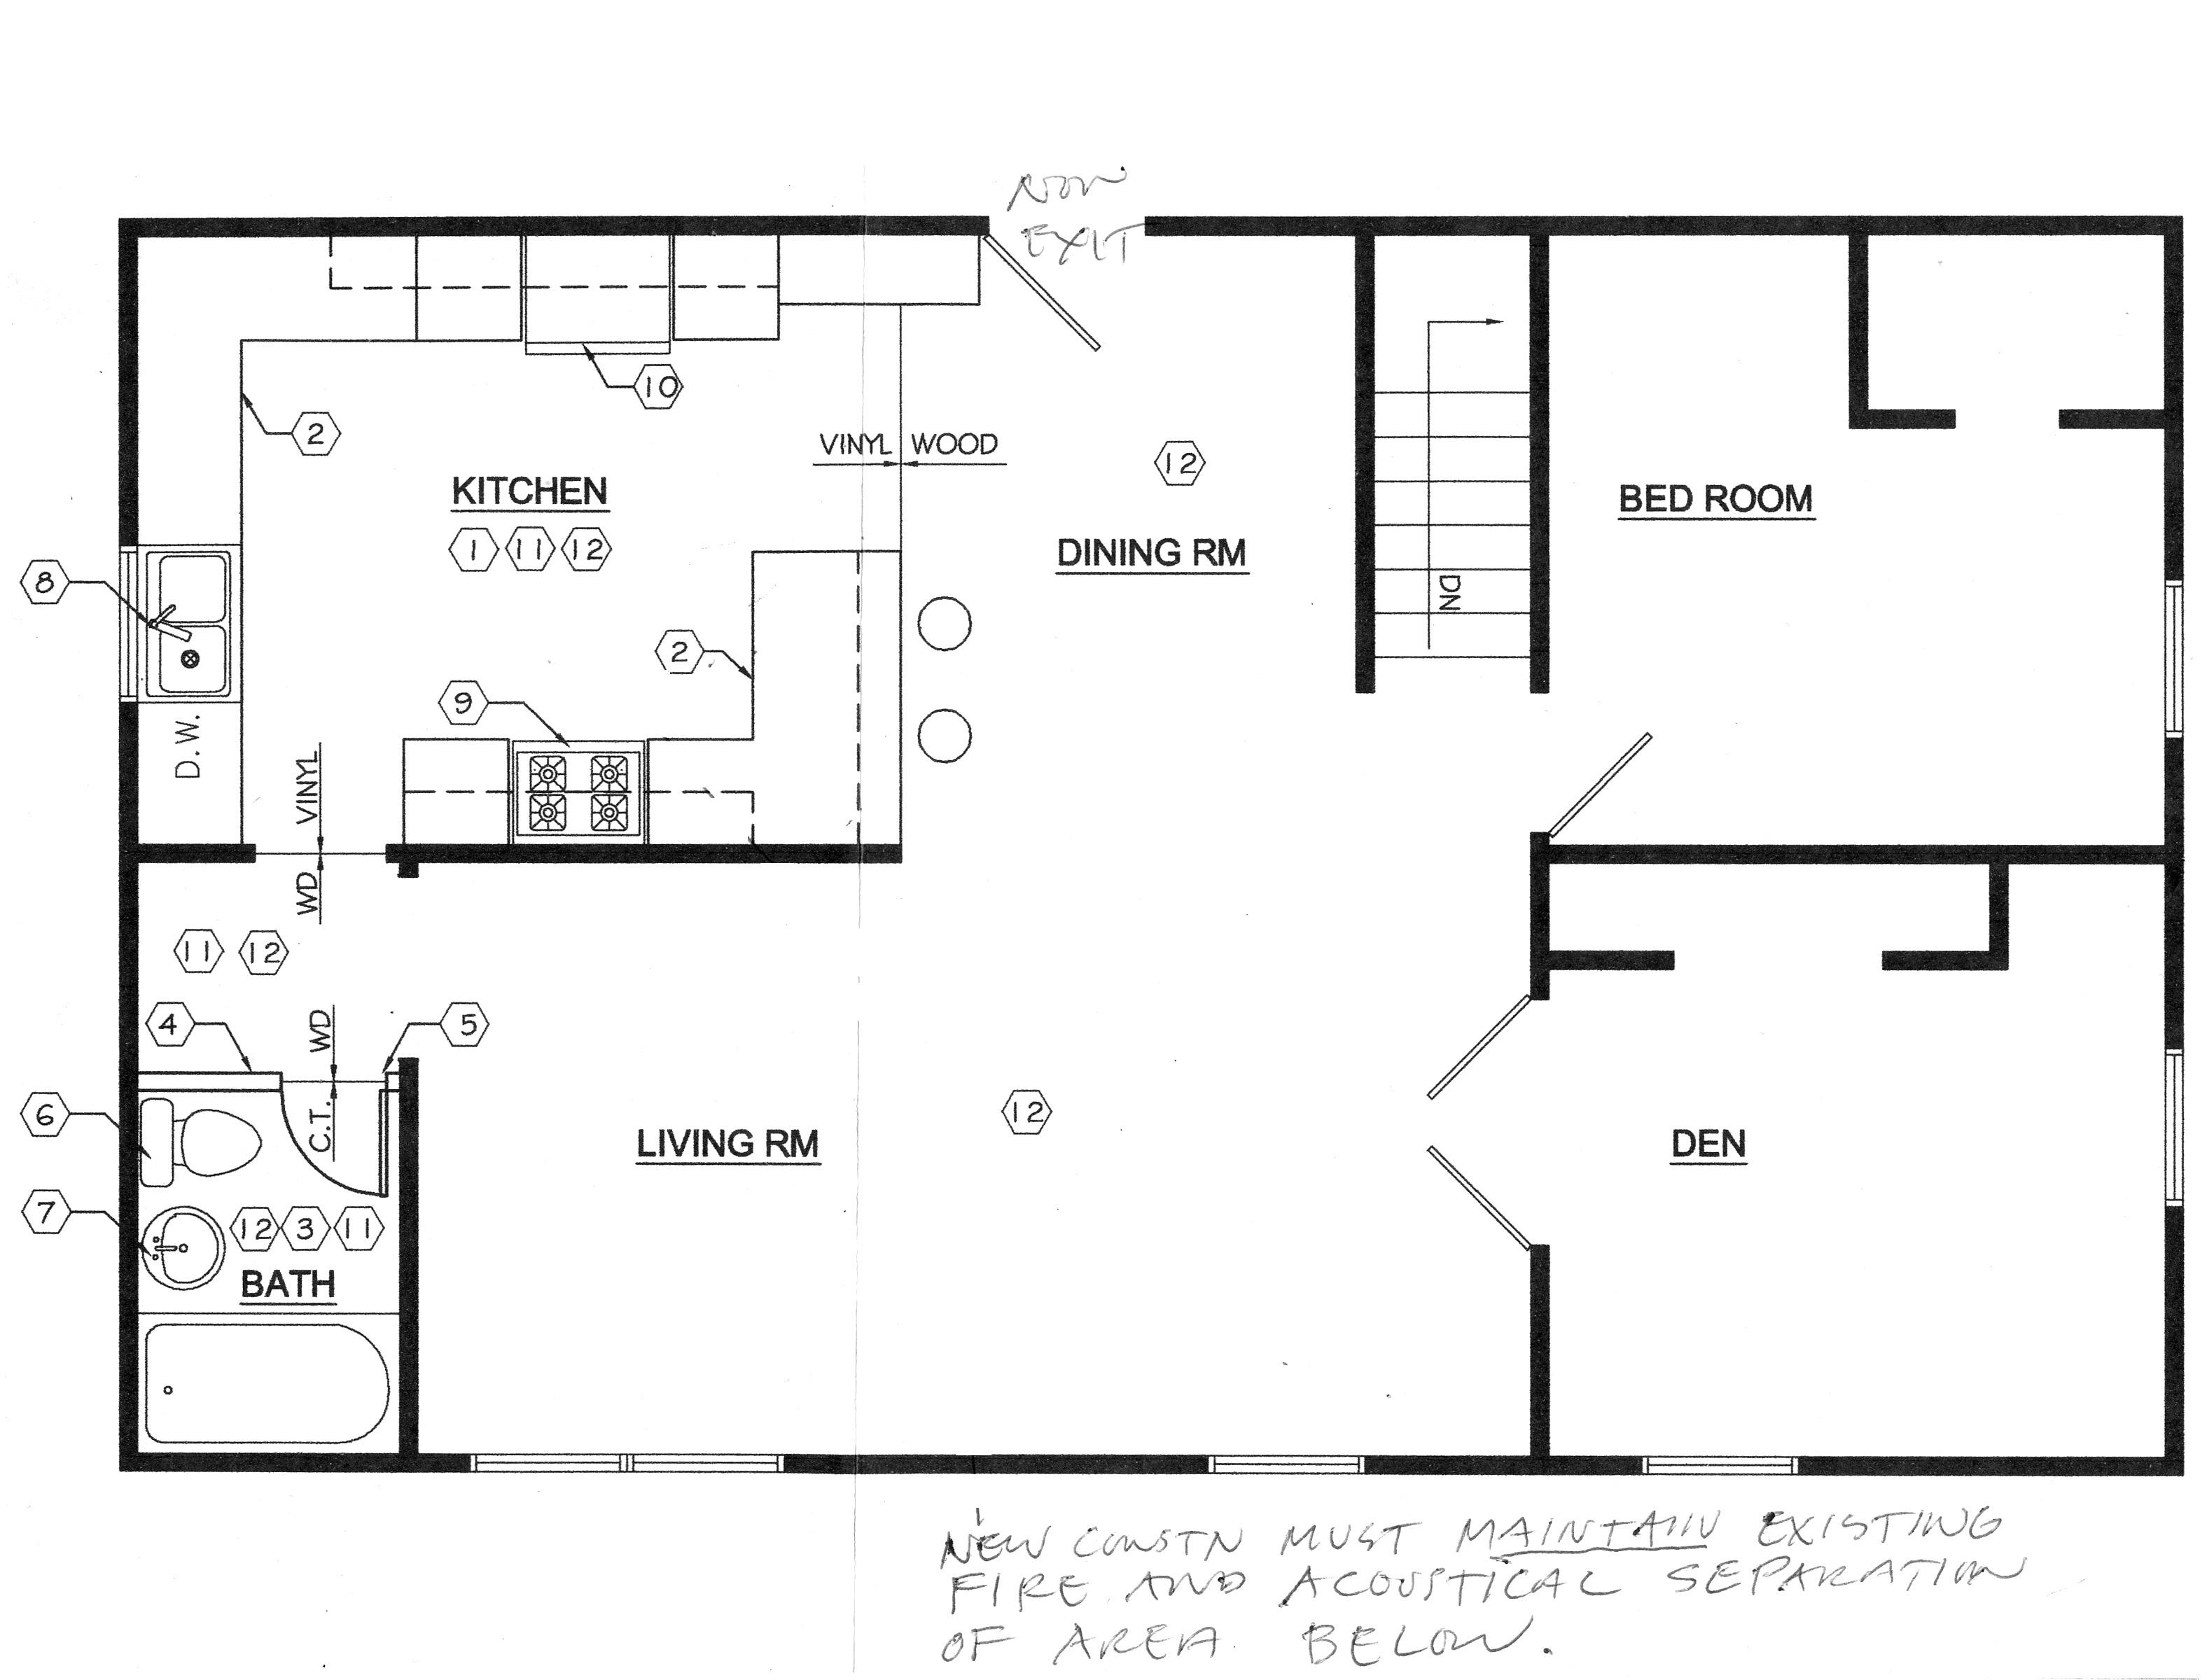 ... kitchen floor plans 3 valuable inspirations 28 floor plans stanford west IDLOCQJ